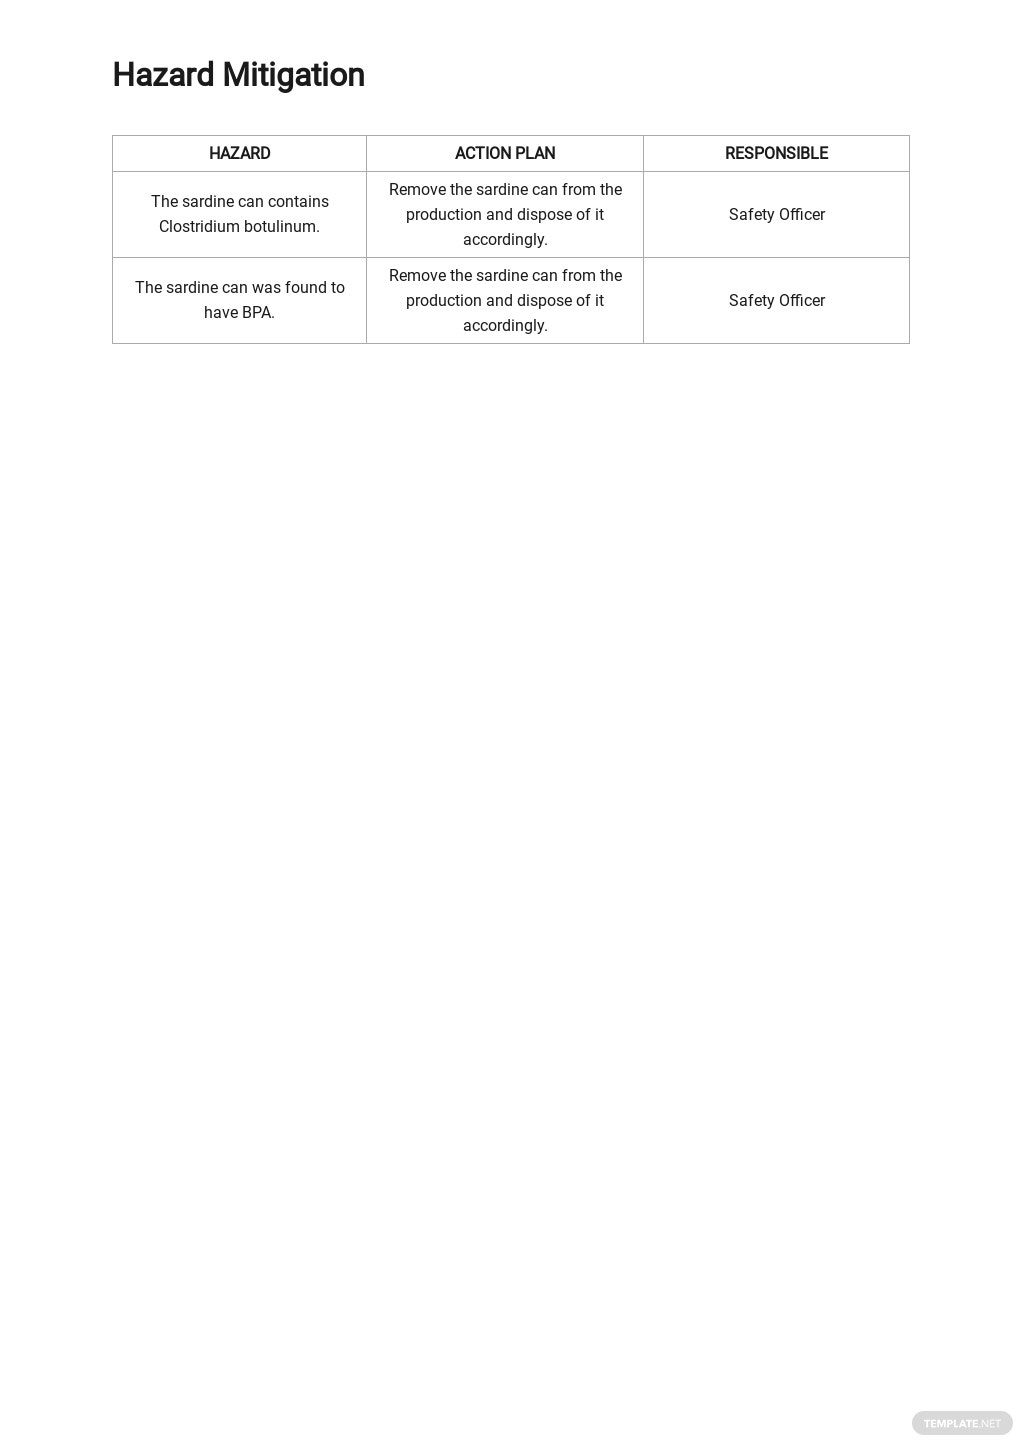 Hazard Analysis Template 3.jpe